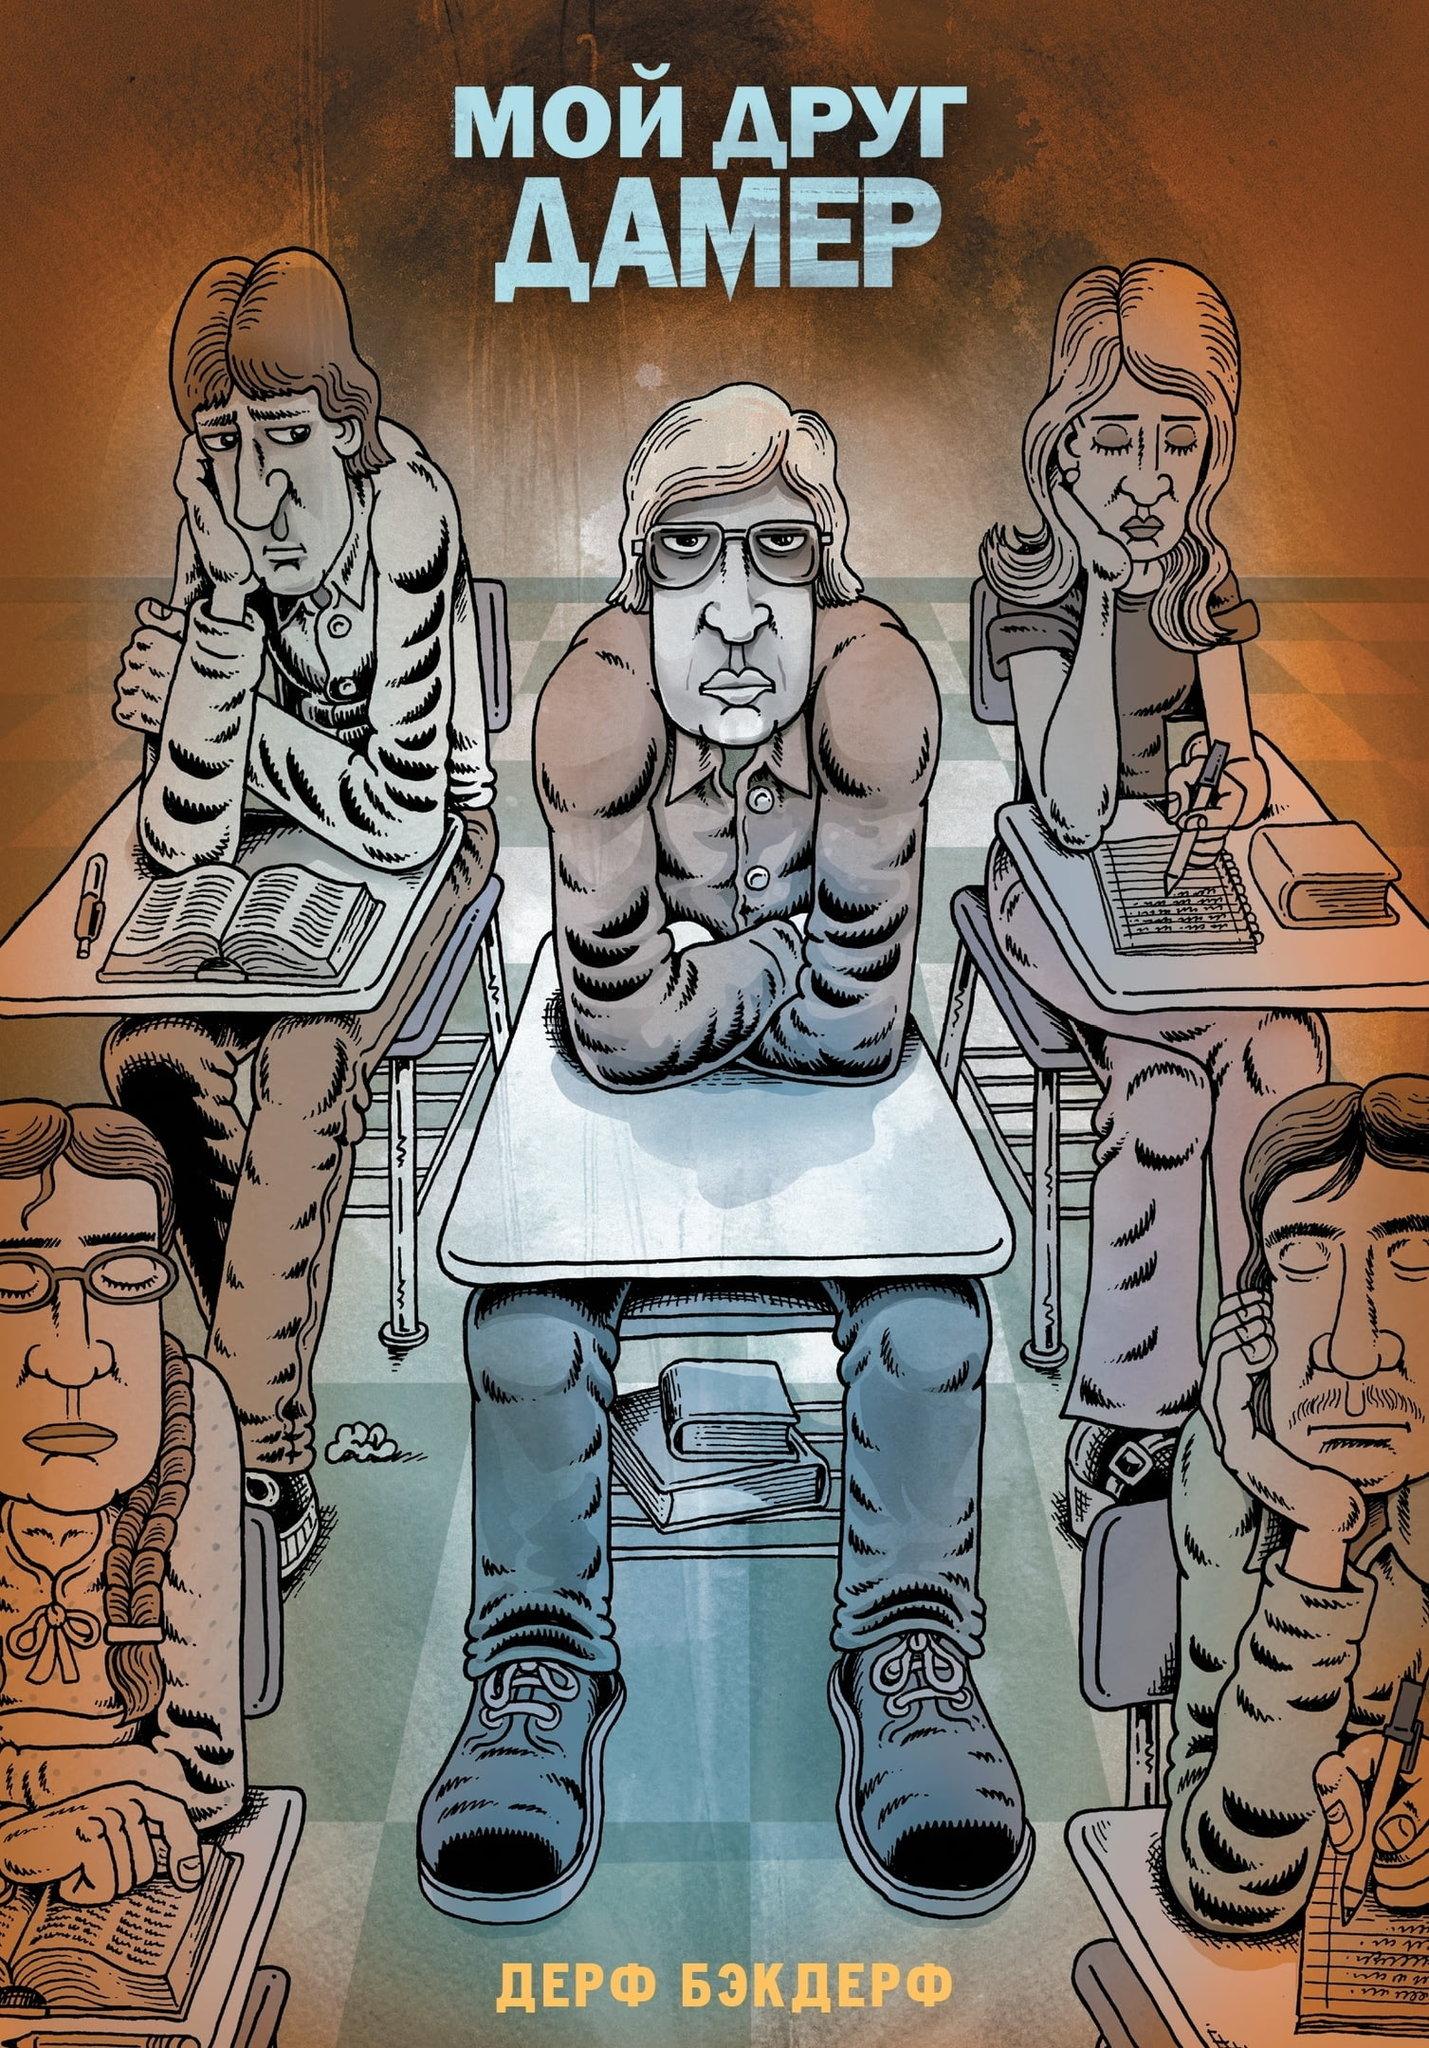 Комикс Мой друг Дамер фото